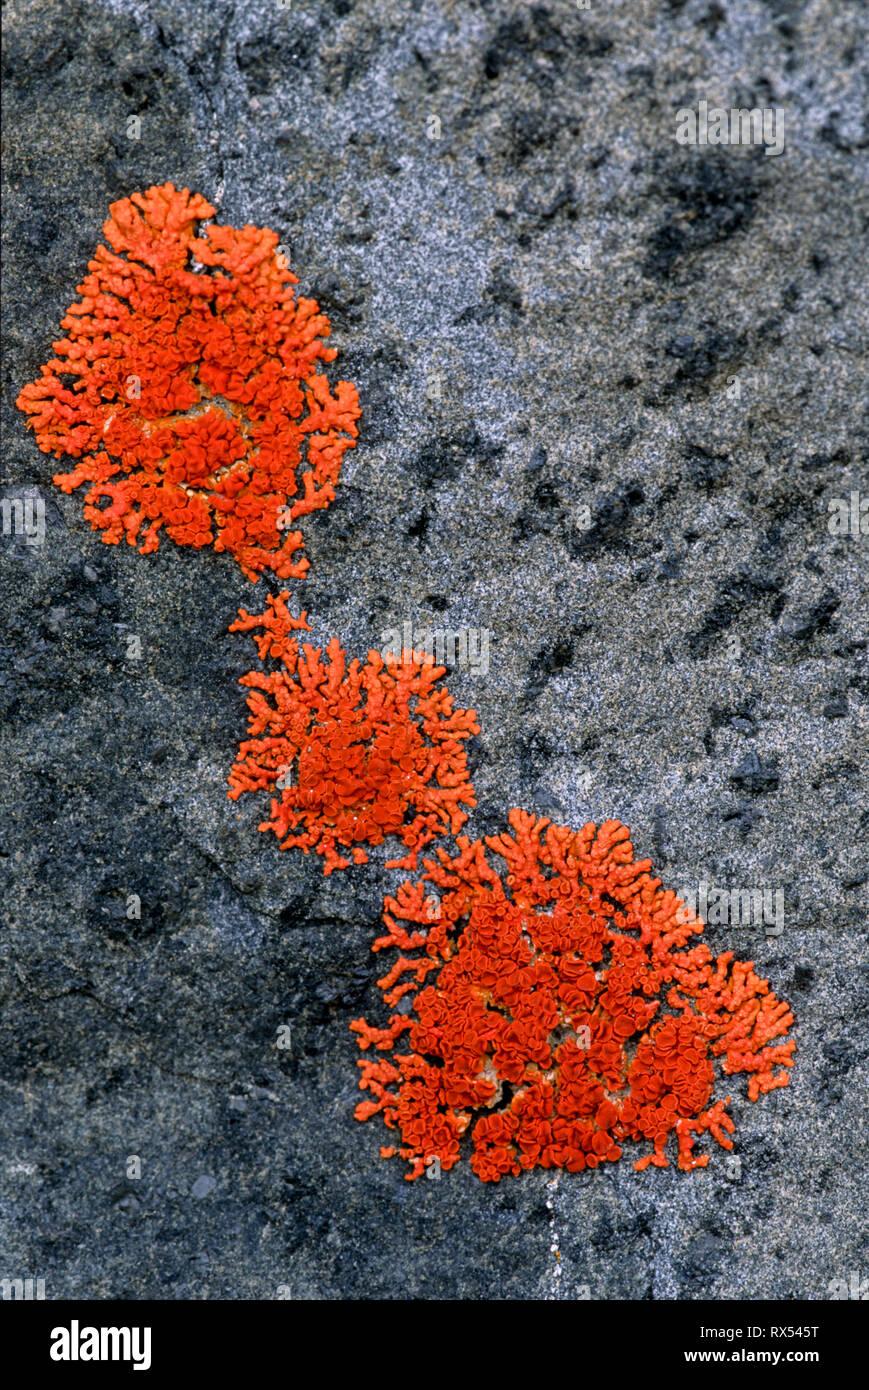 Jewel lichen on rock, Ukkusiksalik National Park, Wager Bay, Nunuvut, Canada - Stock Image